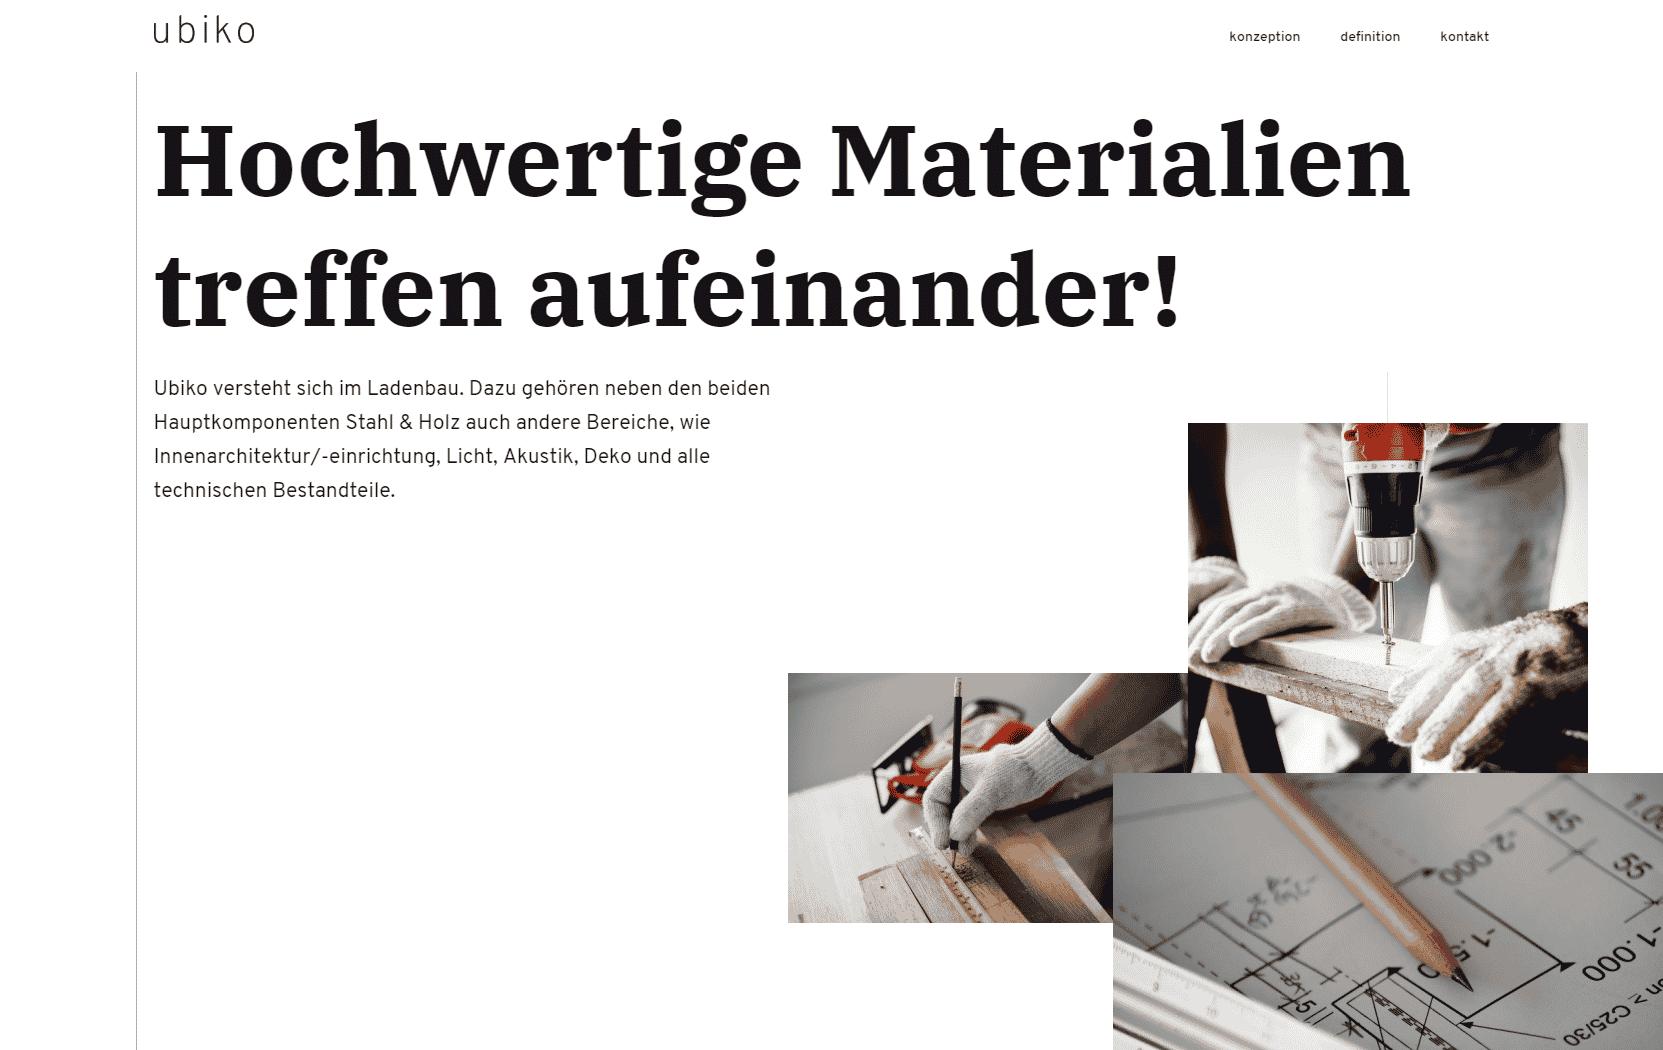 agentur-relaunch-bremen-webdesign-4